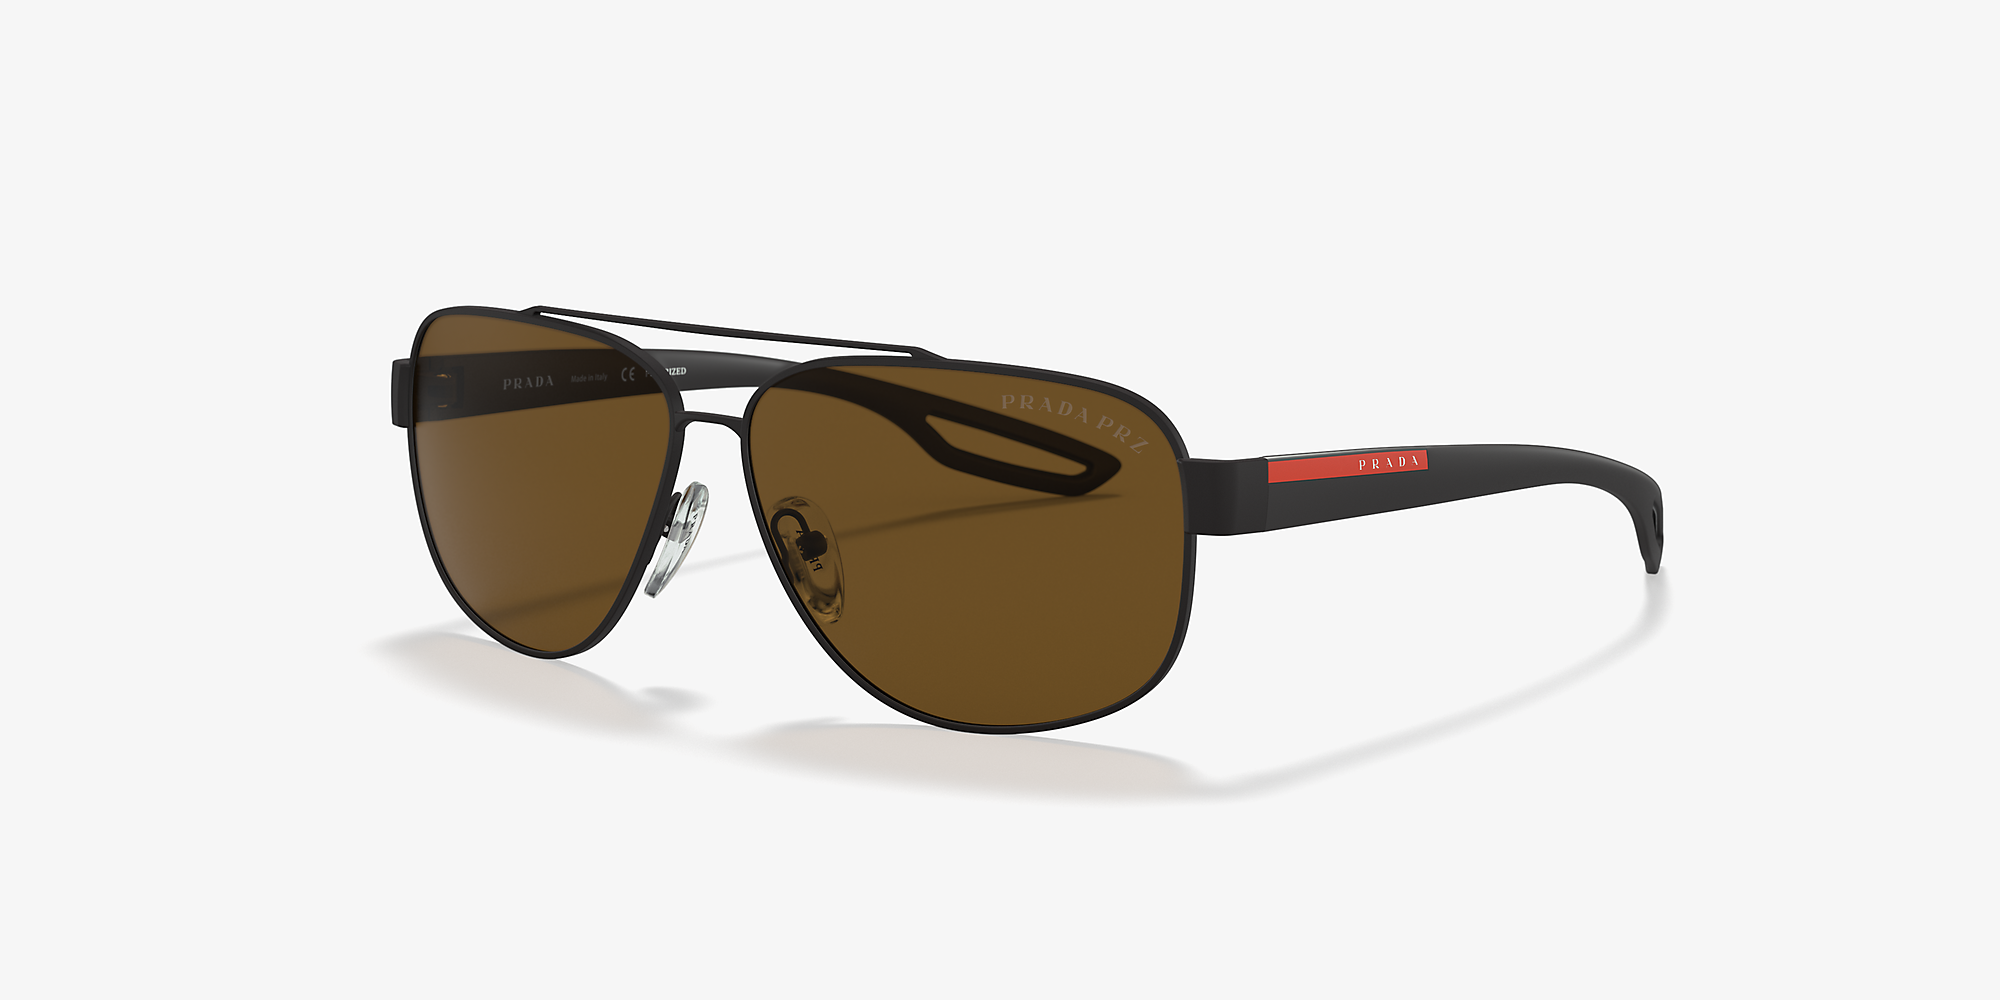 0acbd8f74bc3 Prada Linea Rossa PS 58QS 63 Brown & Black Polarized Sunglasses ...